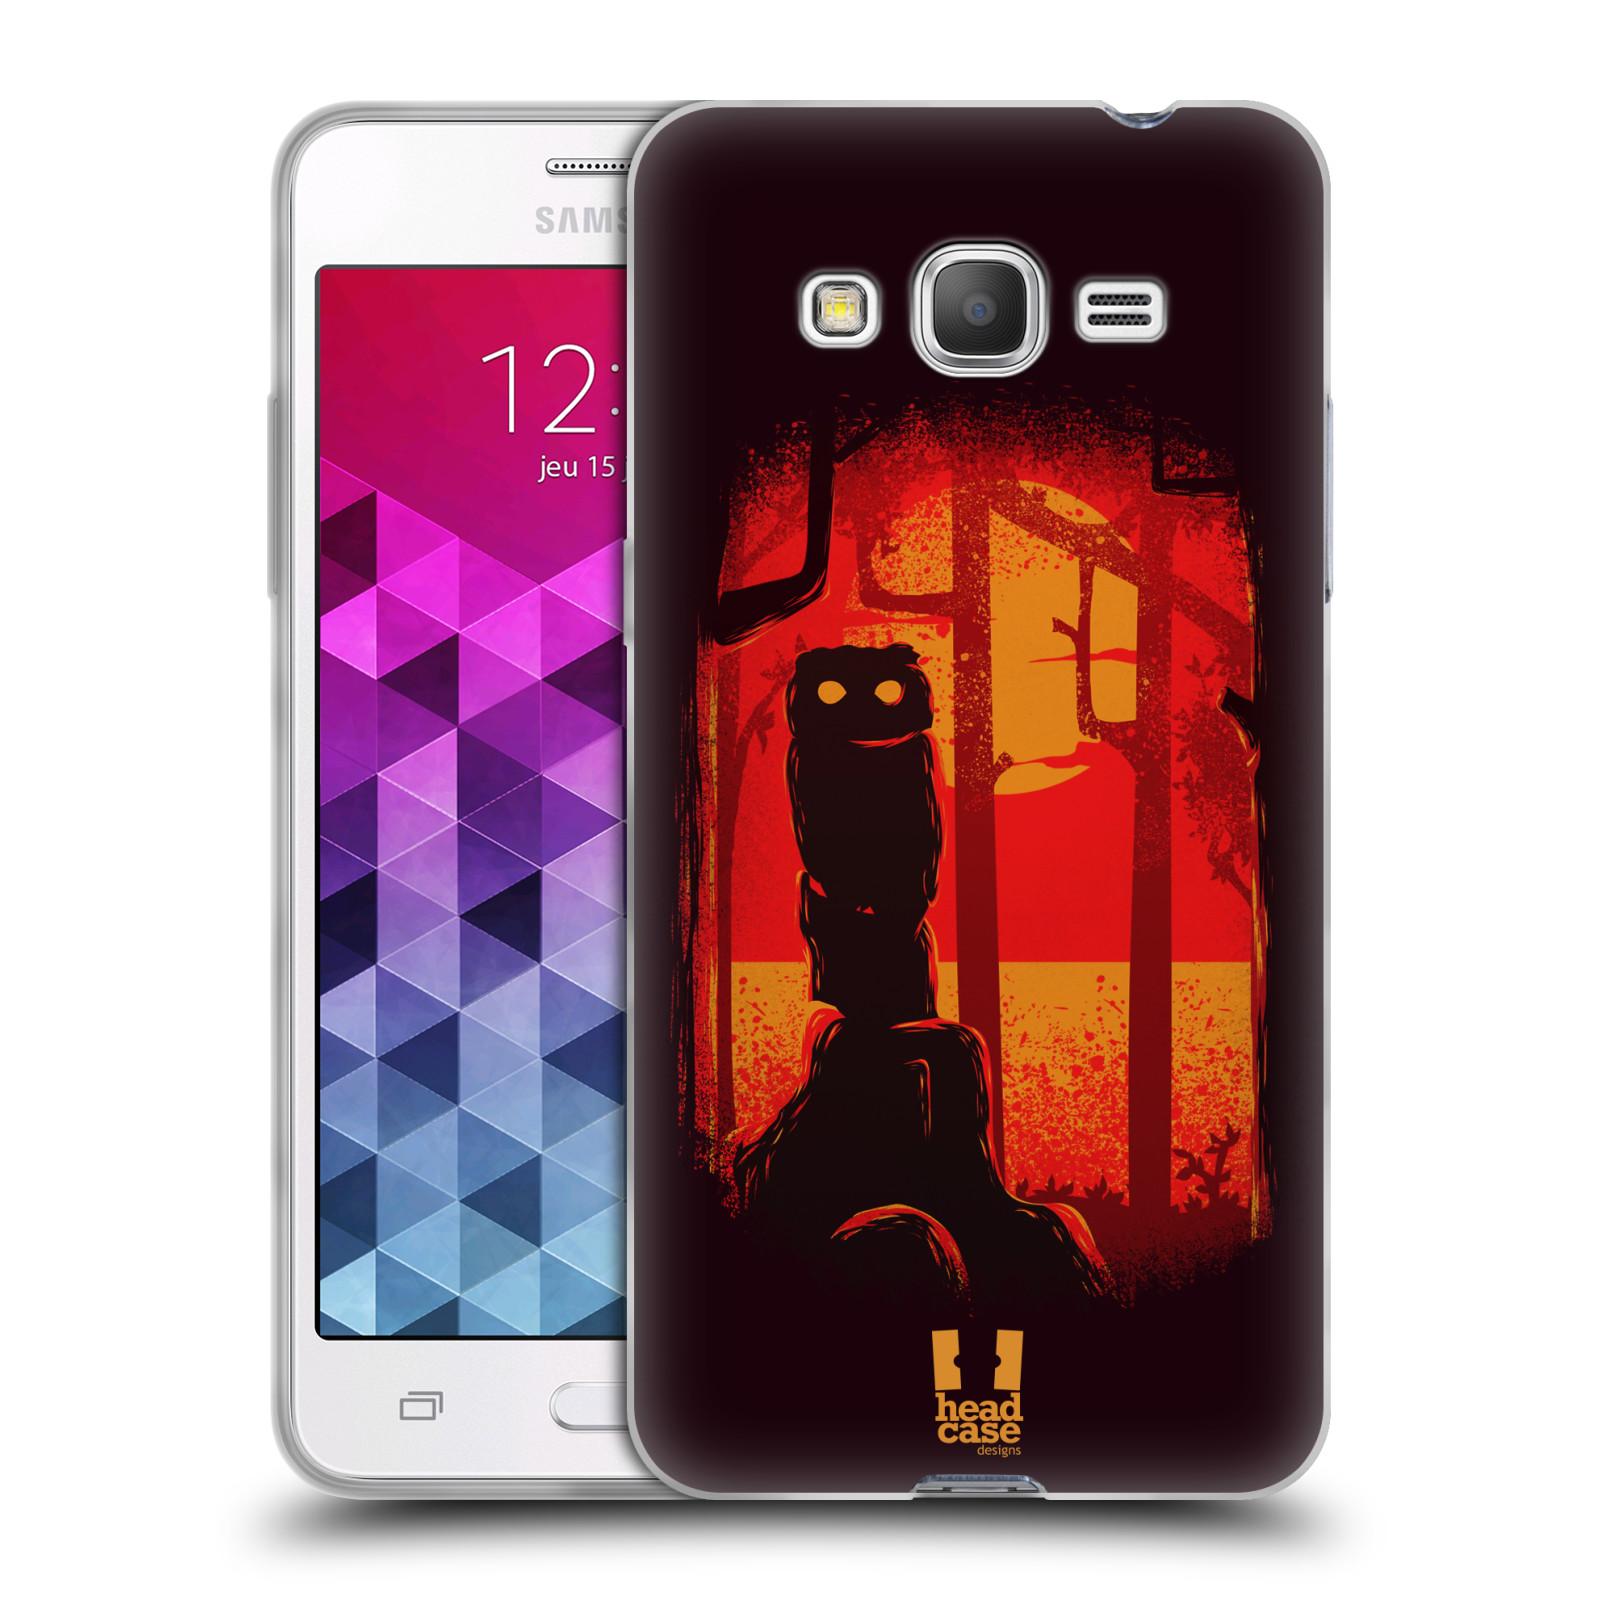 Silikonové pouzdro na mobil Samsung Galaxy Grand Prime VE - Head Case - Sova v tajemném lese